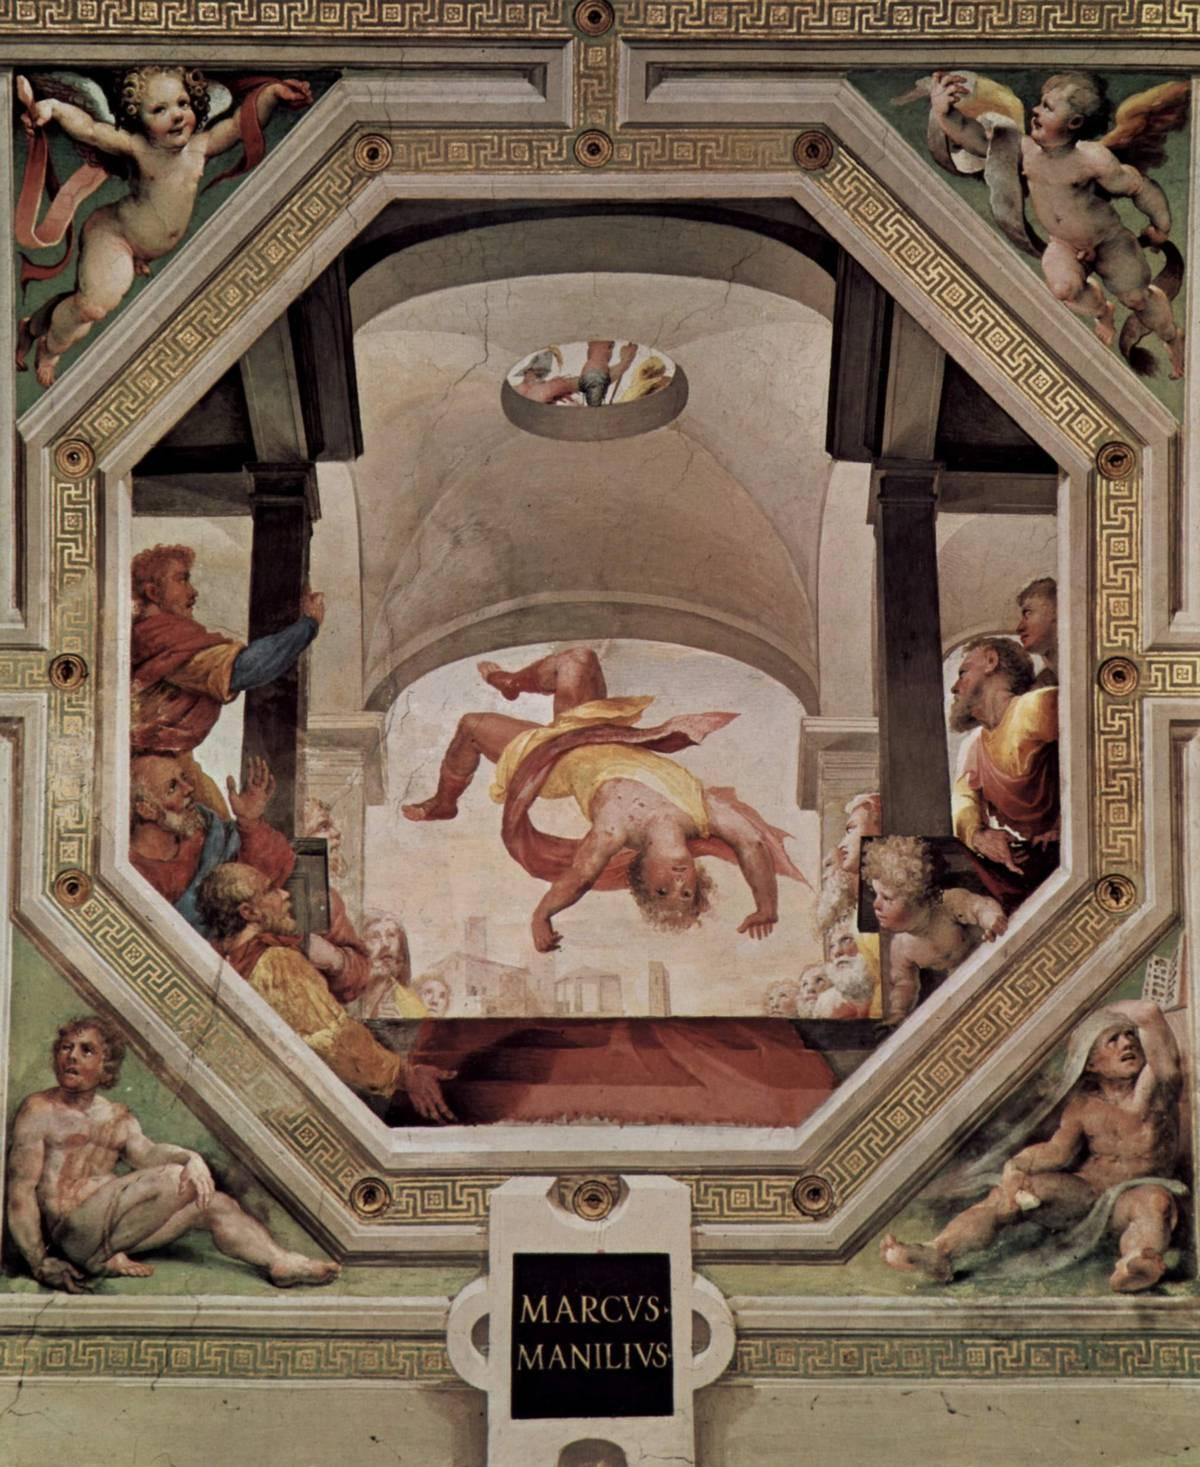 Manlius Capitolinus tossed from the Tarpeian Rock by Domenico di Pace Beccafumi, in Palazzo Pubblico of Siena